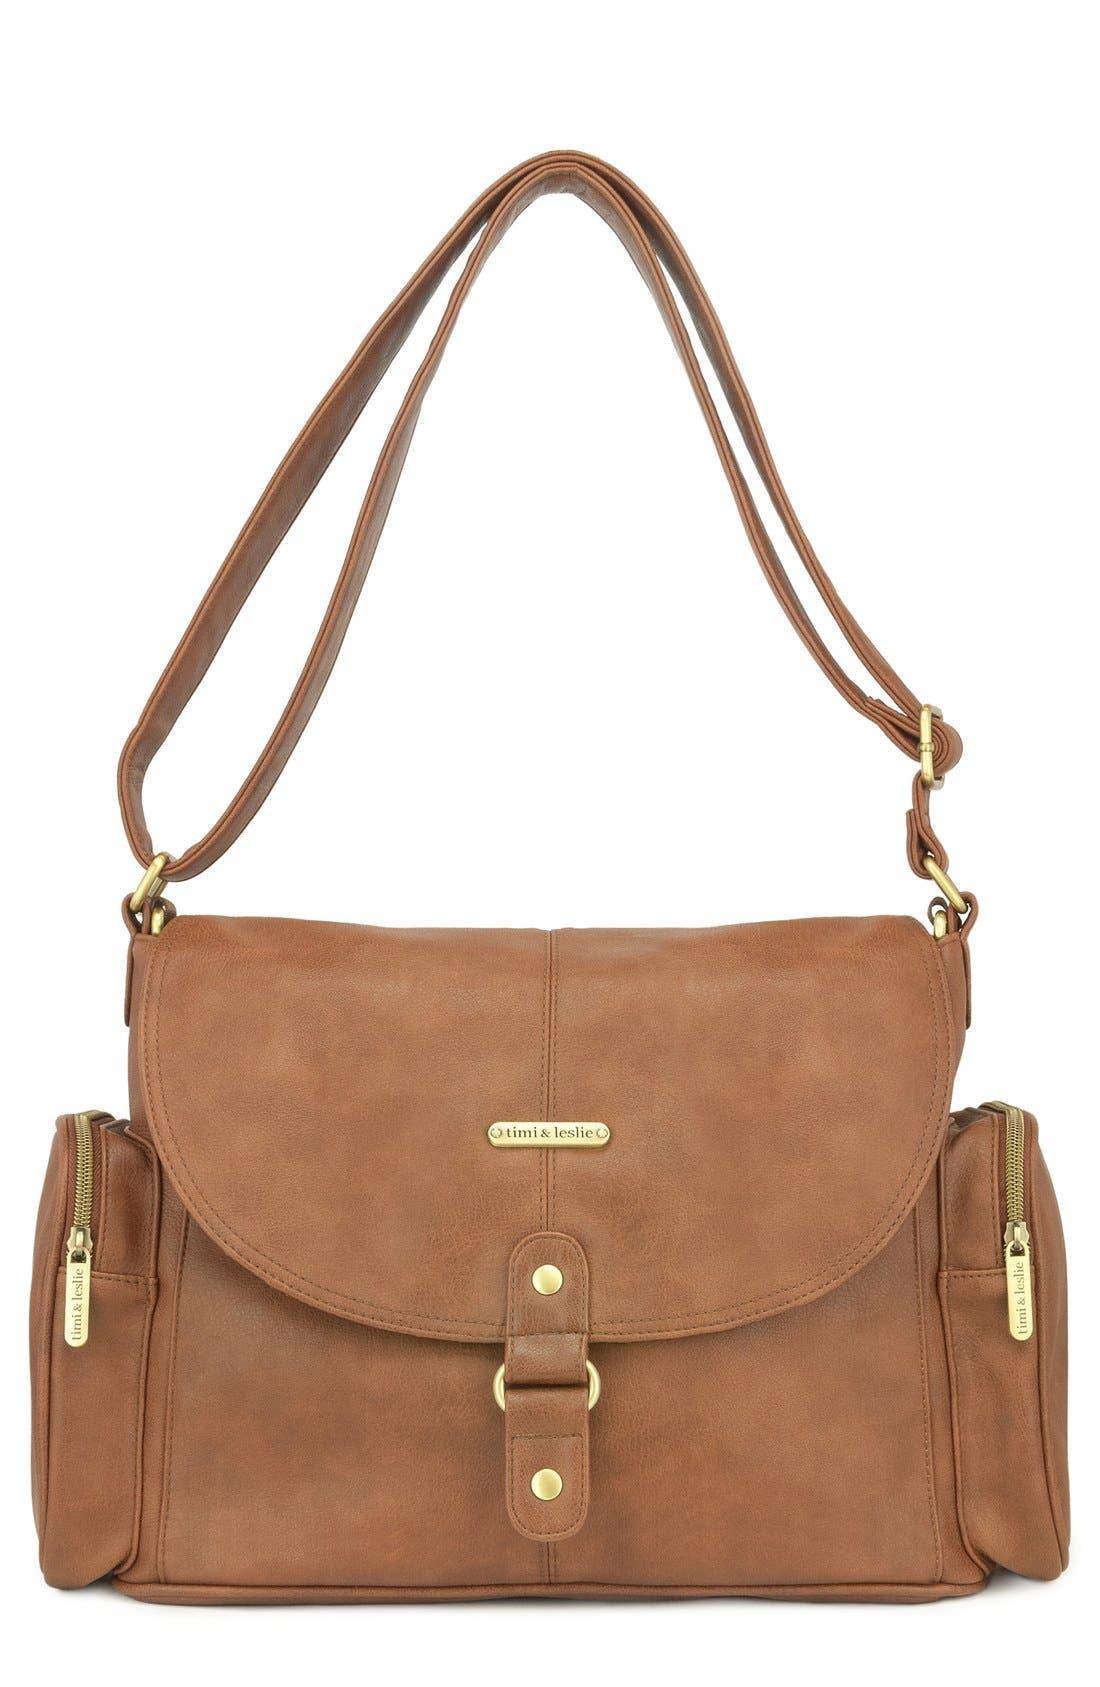 Main Image - Timi & Leslie 'Metro Messenger' Faux Leather Diaper Bag